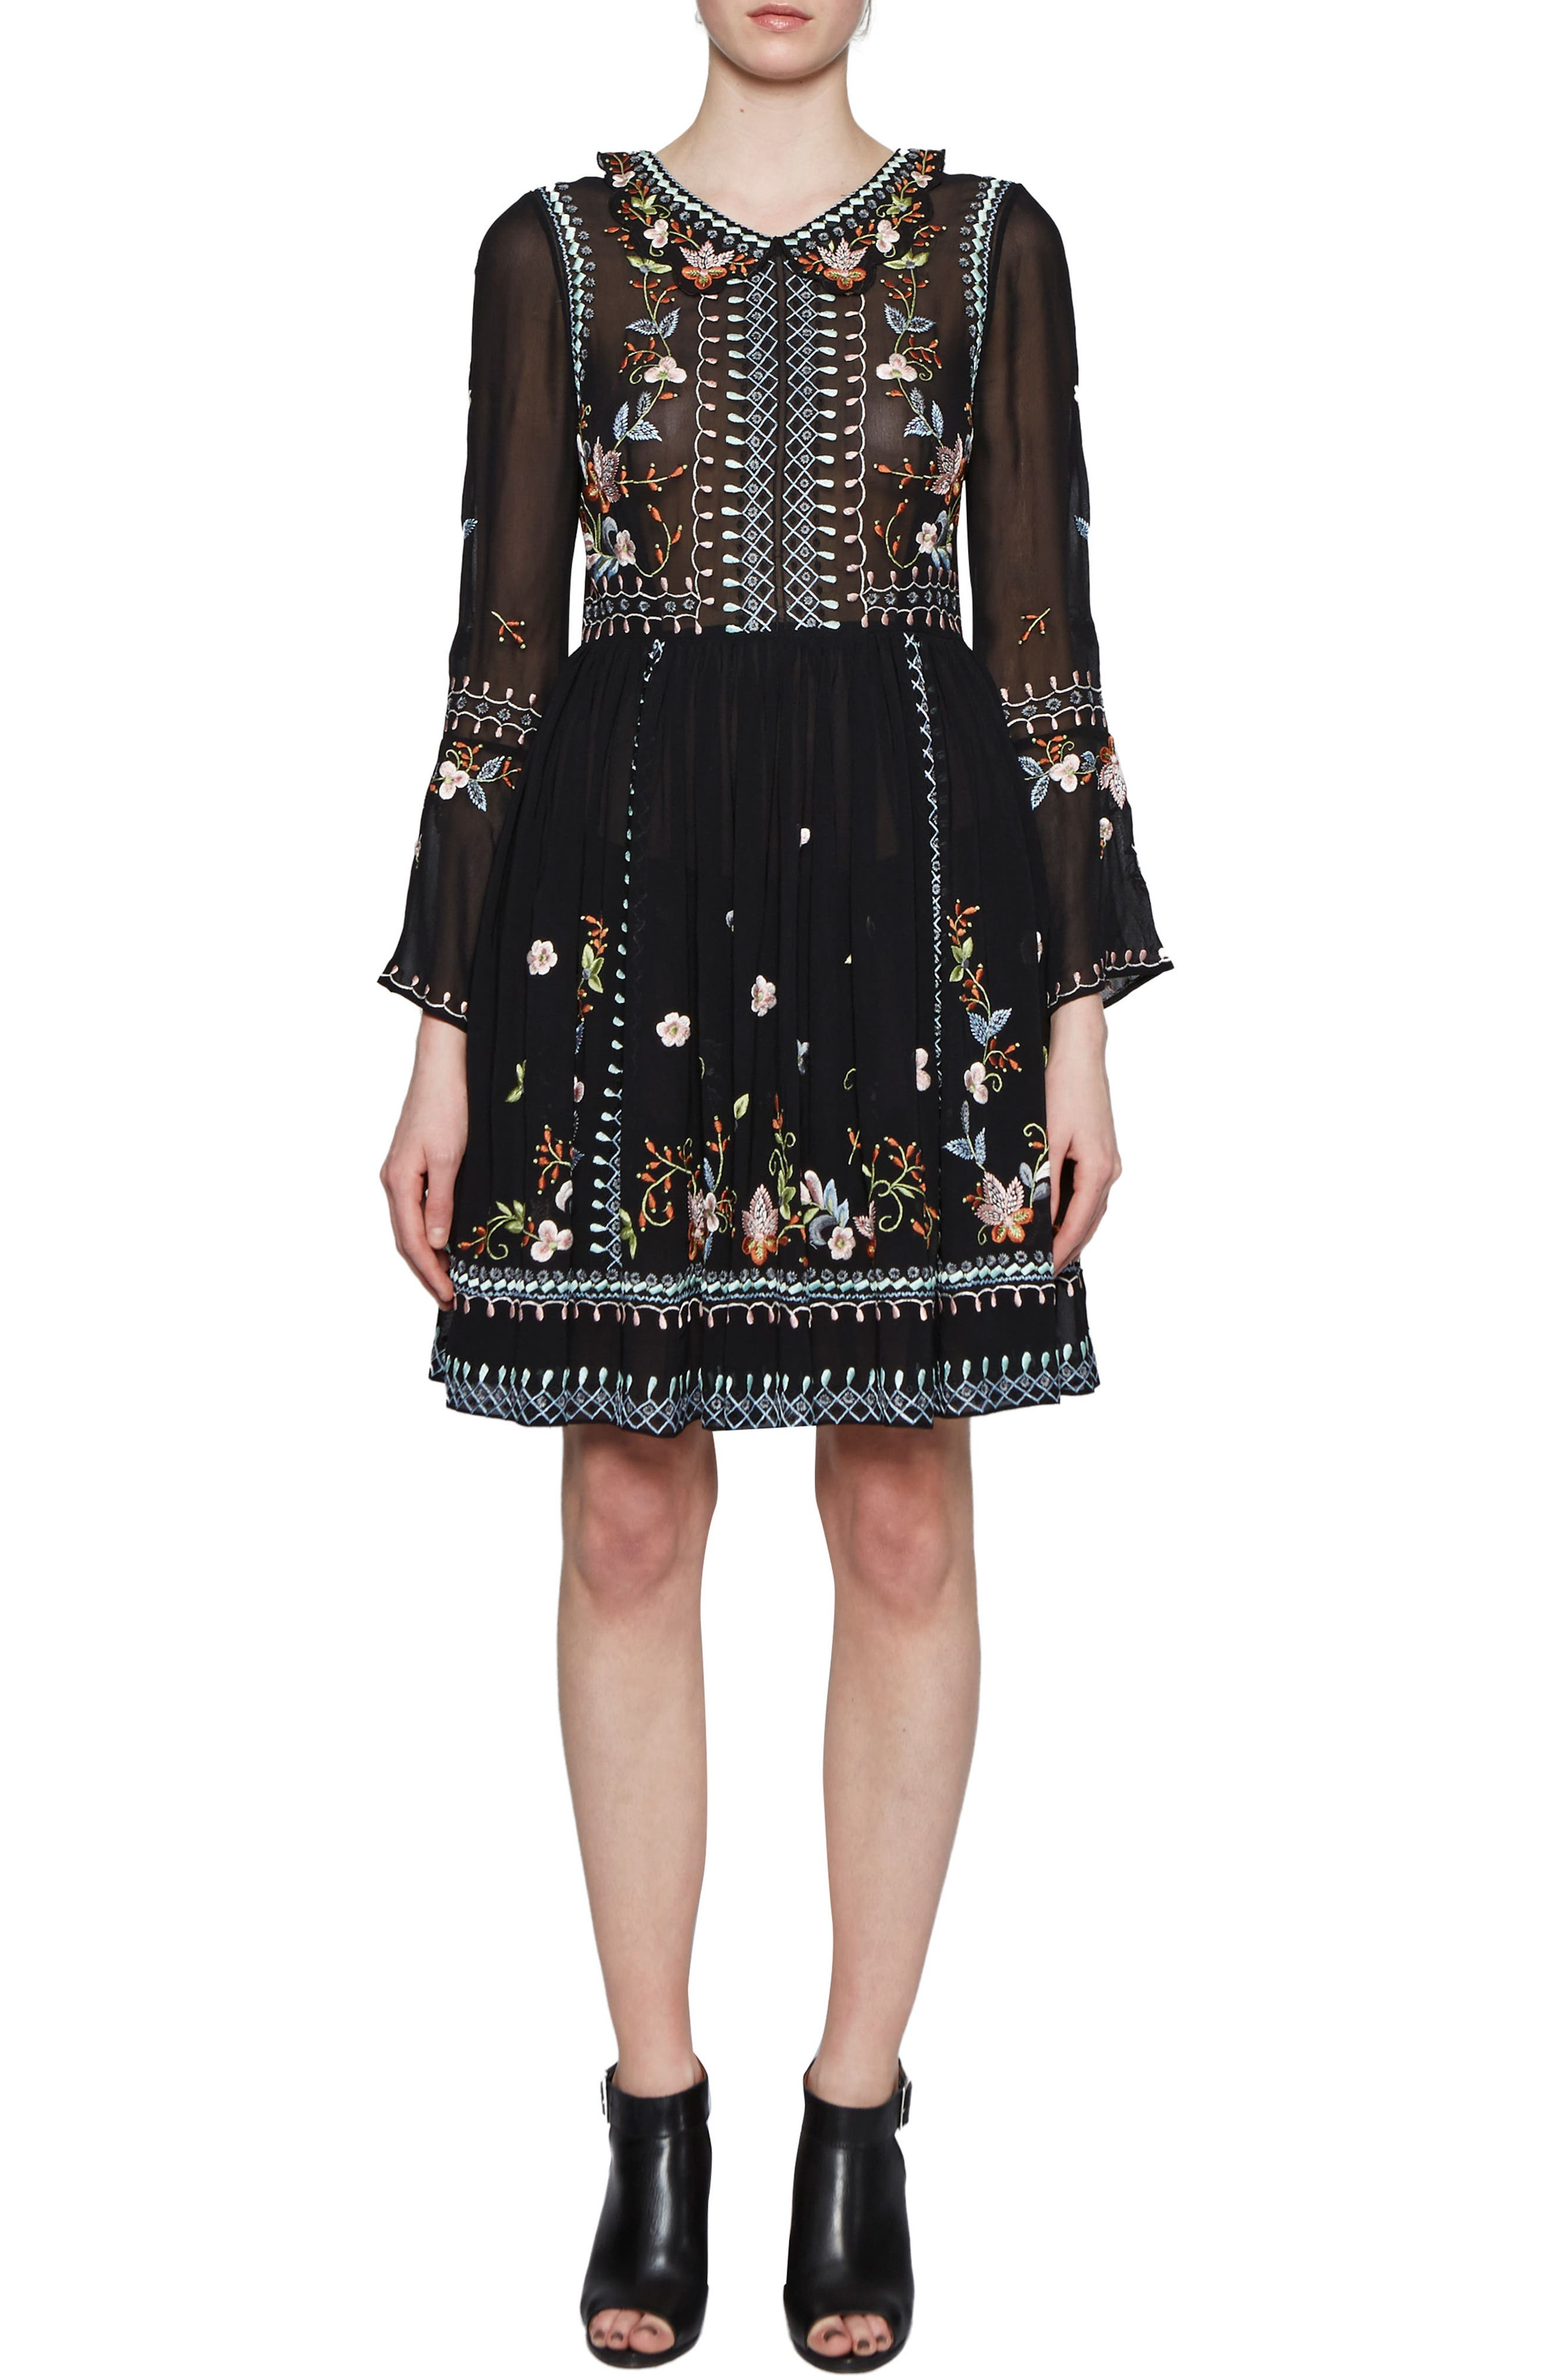 FRENCH CONNECTION Bijou Stitch A-Line Dress, Main, color, 007